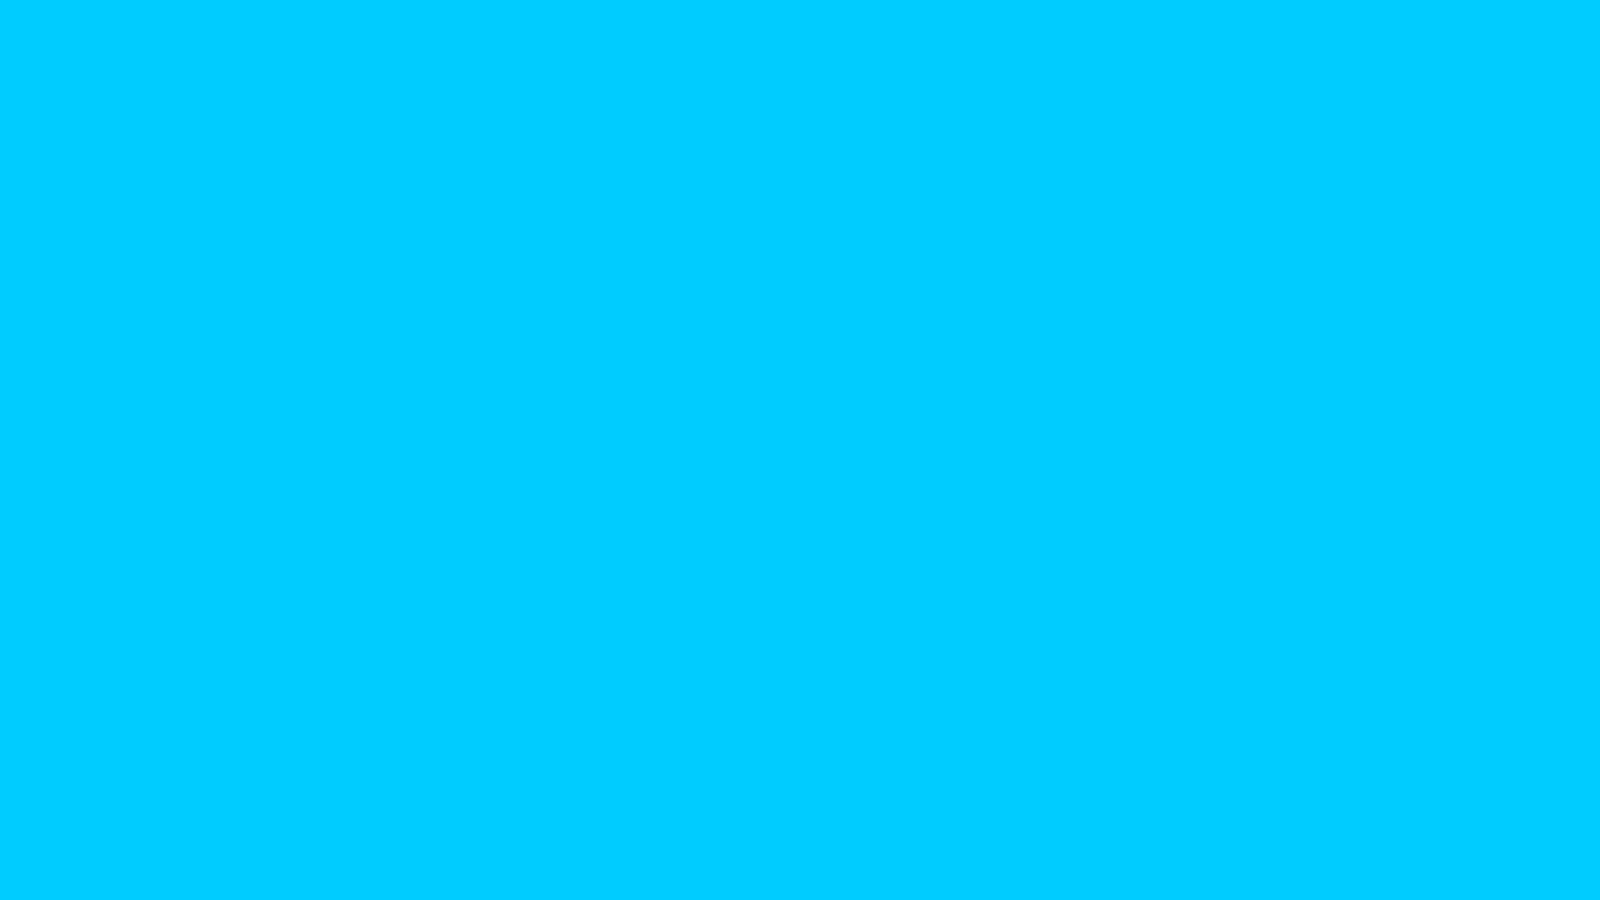 1600x900 Vivid Sky Blue Solid Color Background